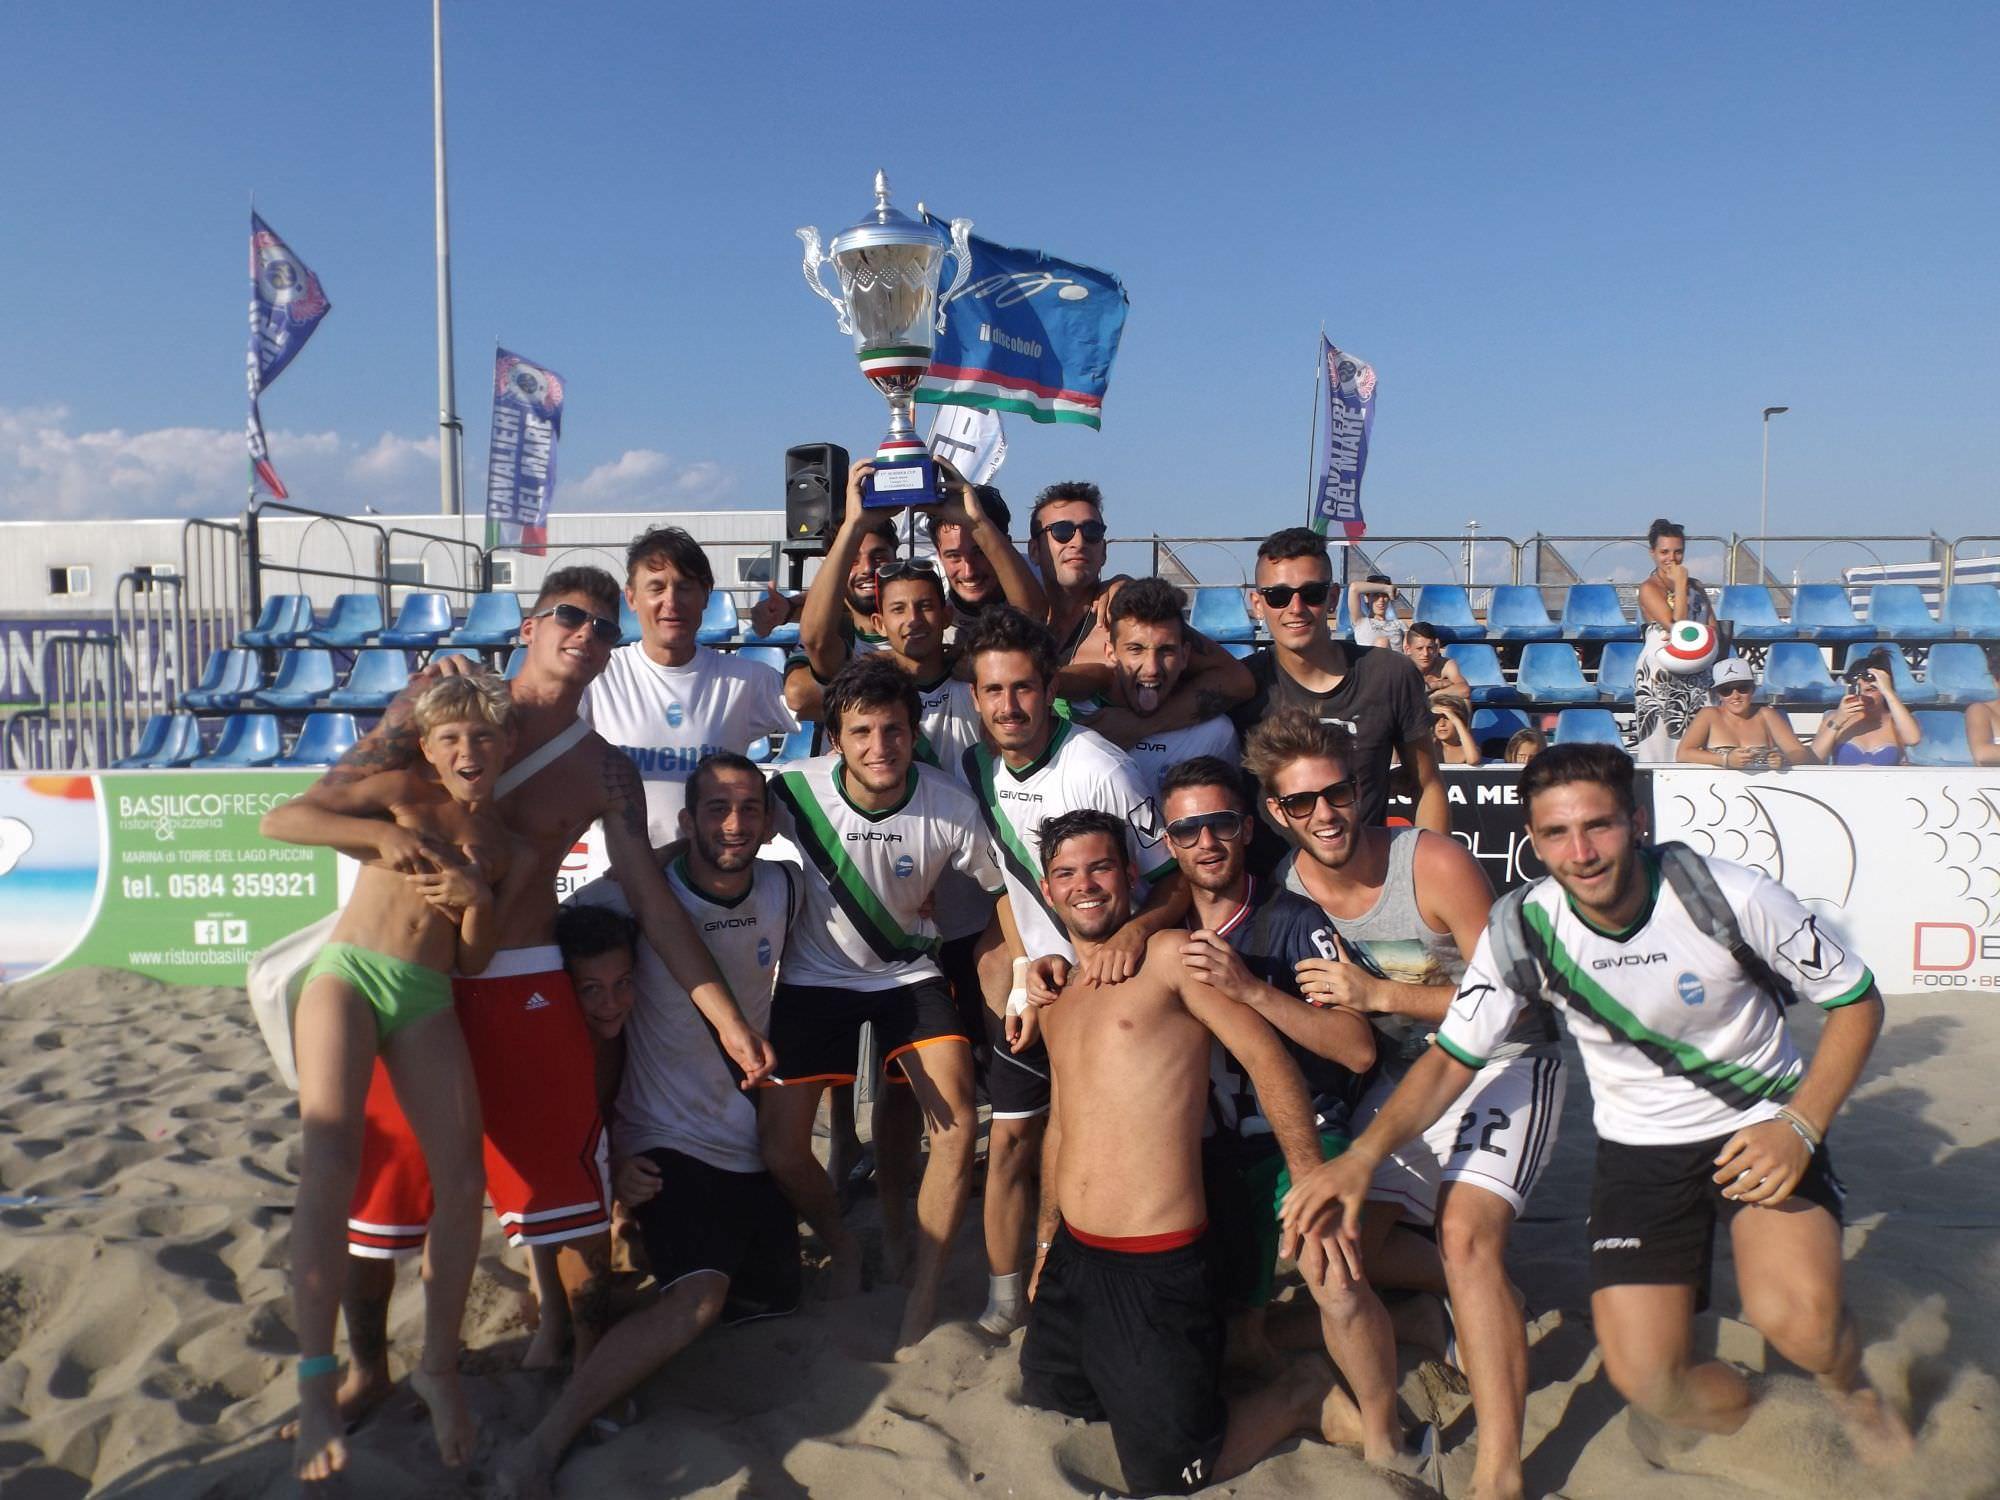 Al Discobolo Beach la Summer Cup